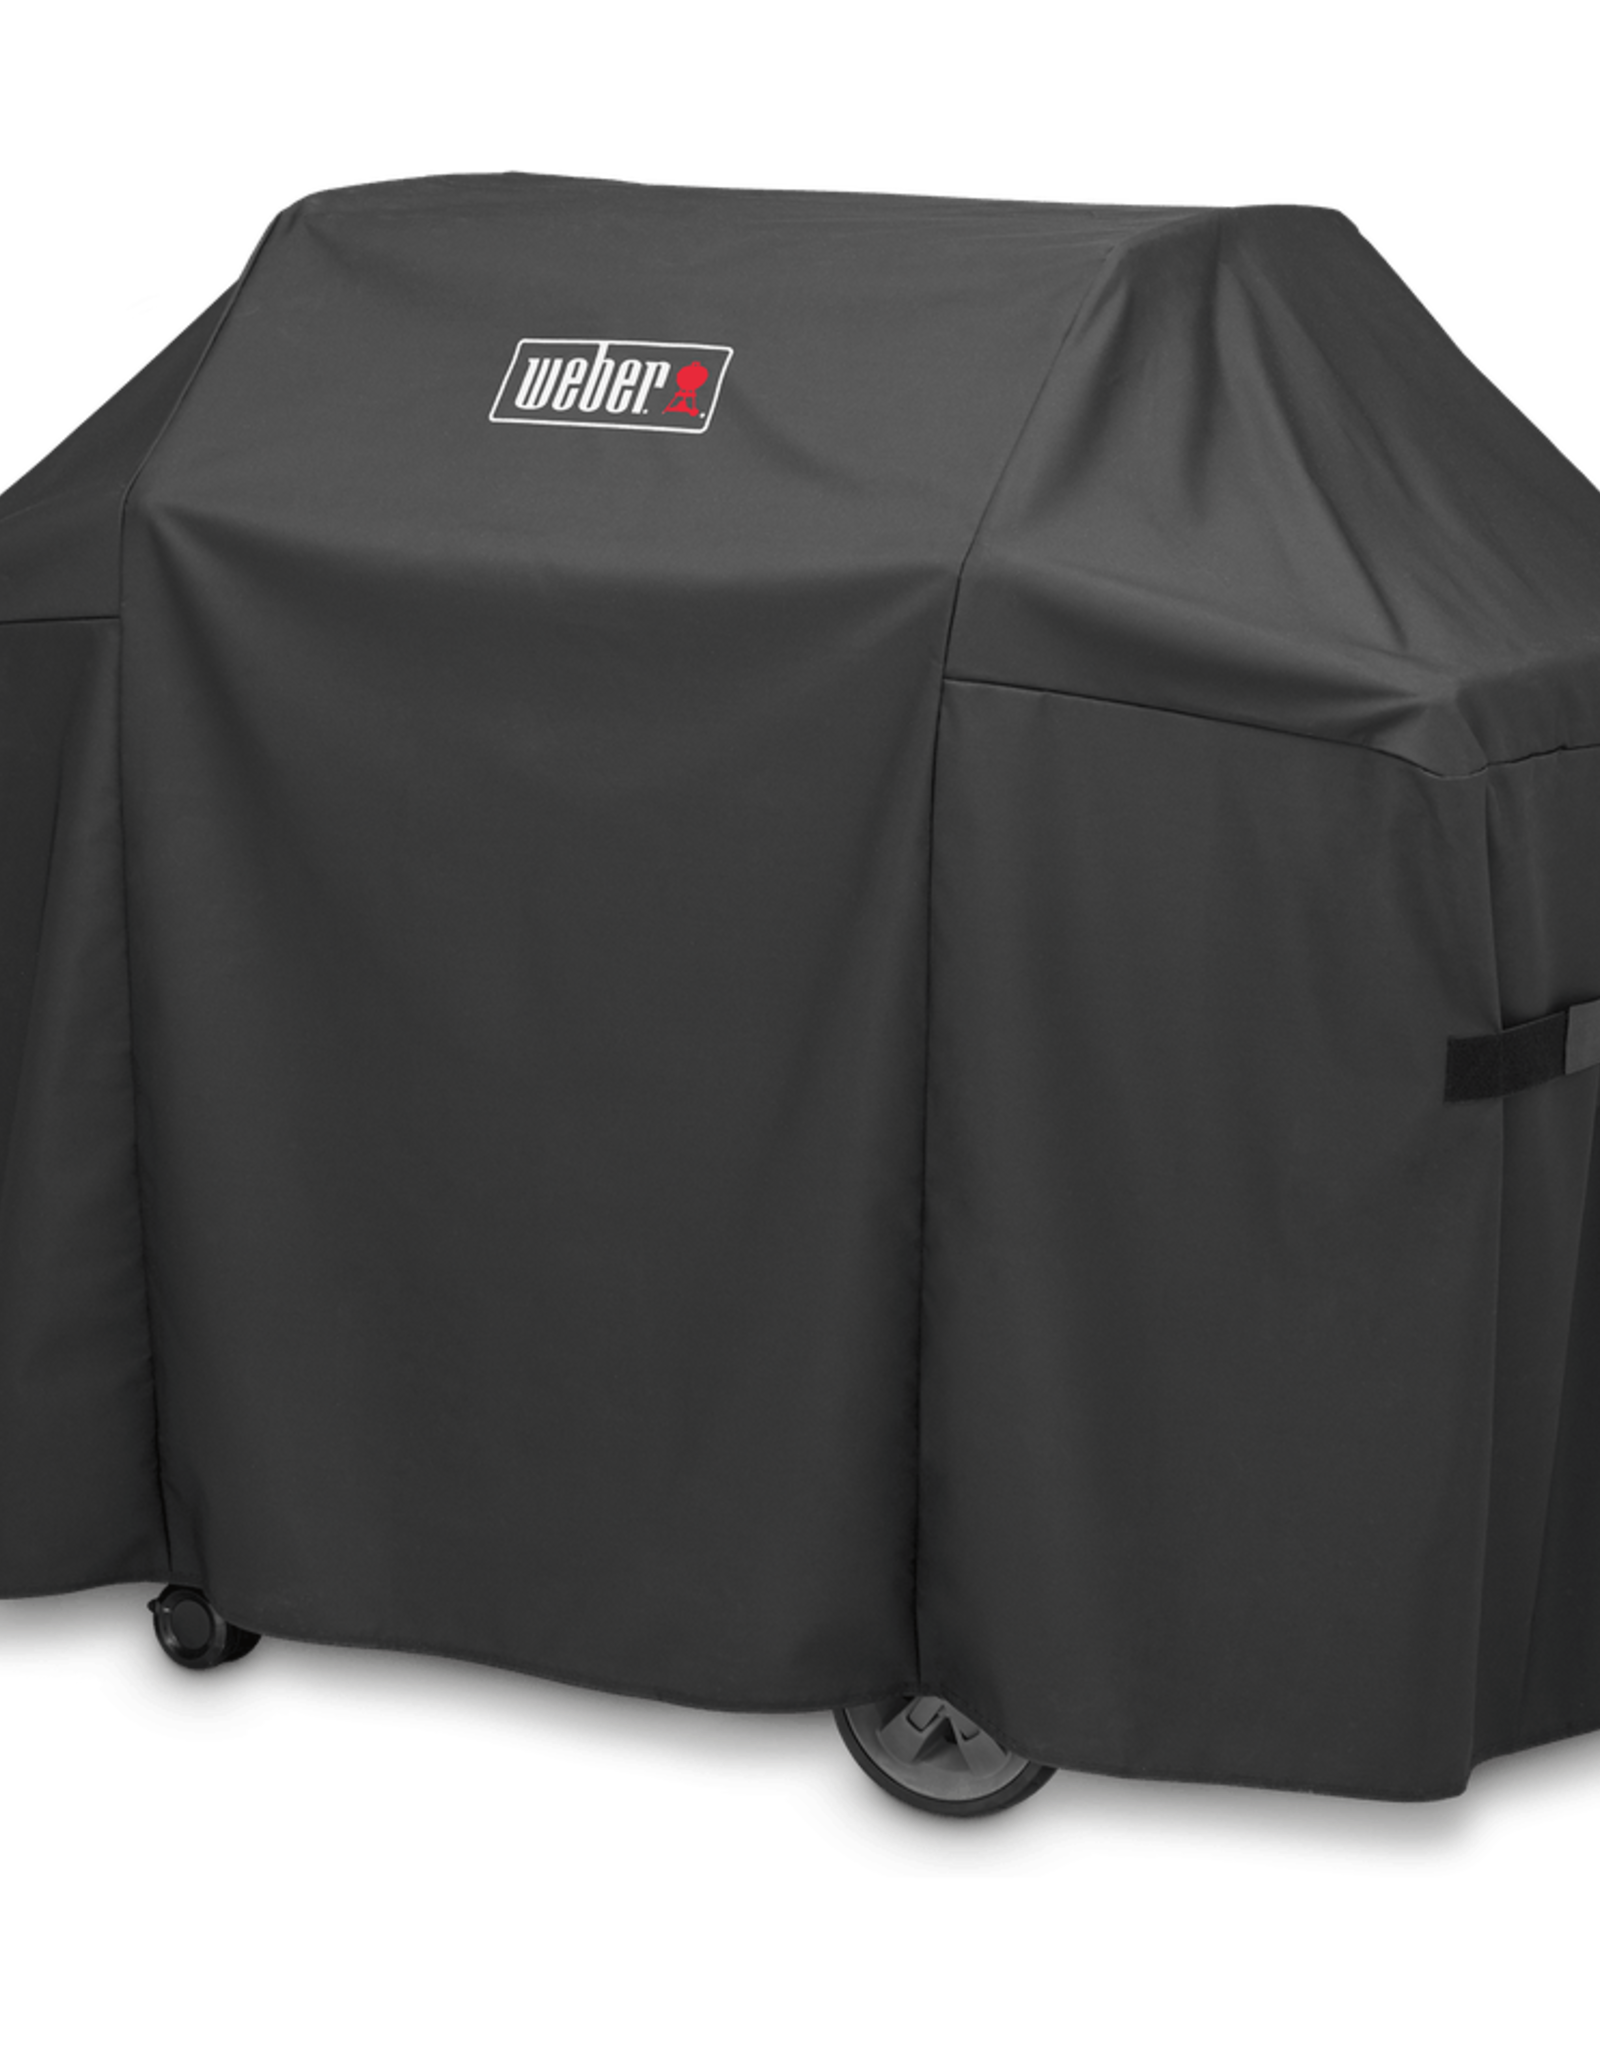 Weber Premium Grill Cover - Fits Genesis II/LX 300 series